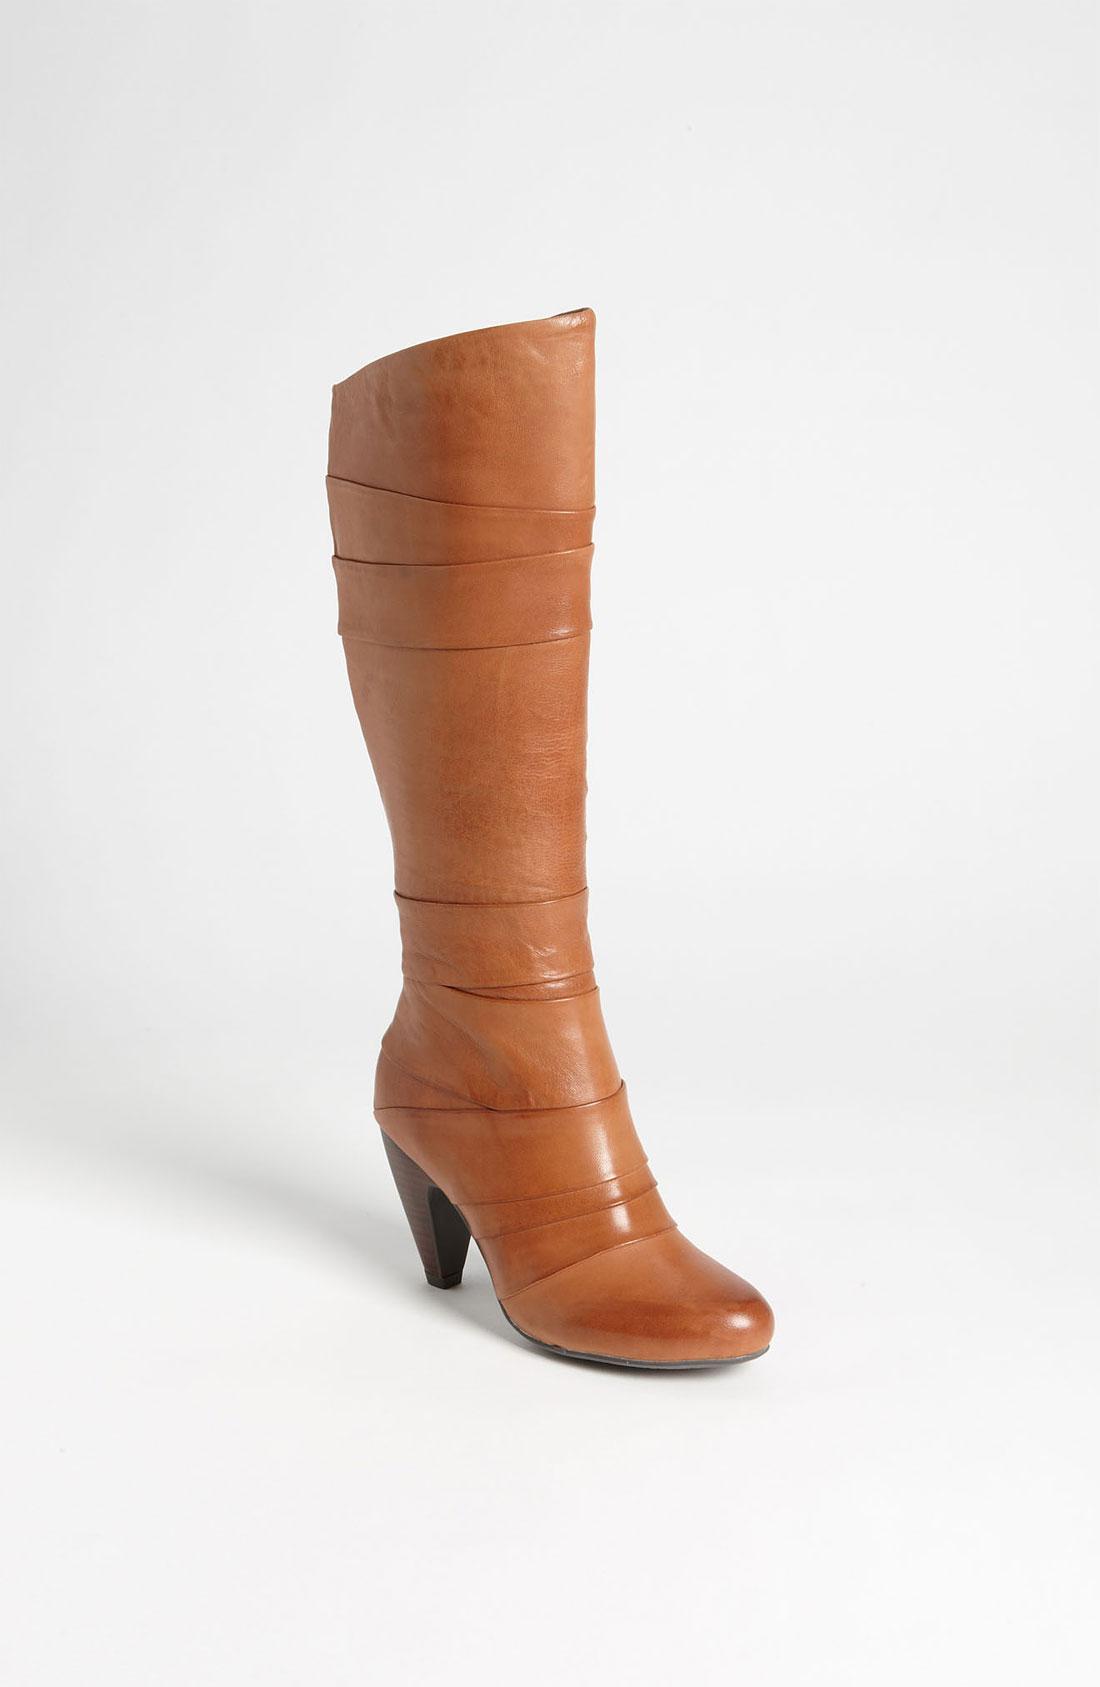 Miz Mooz Miz Mooz Feist Boot In Brown Whiskey Leather